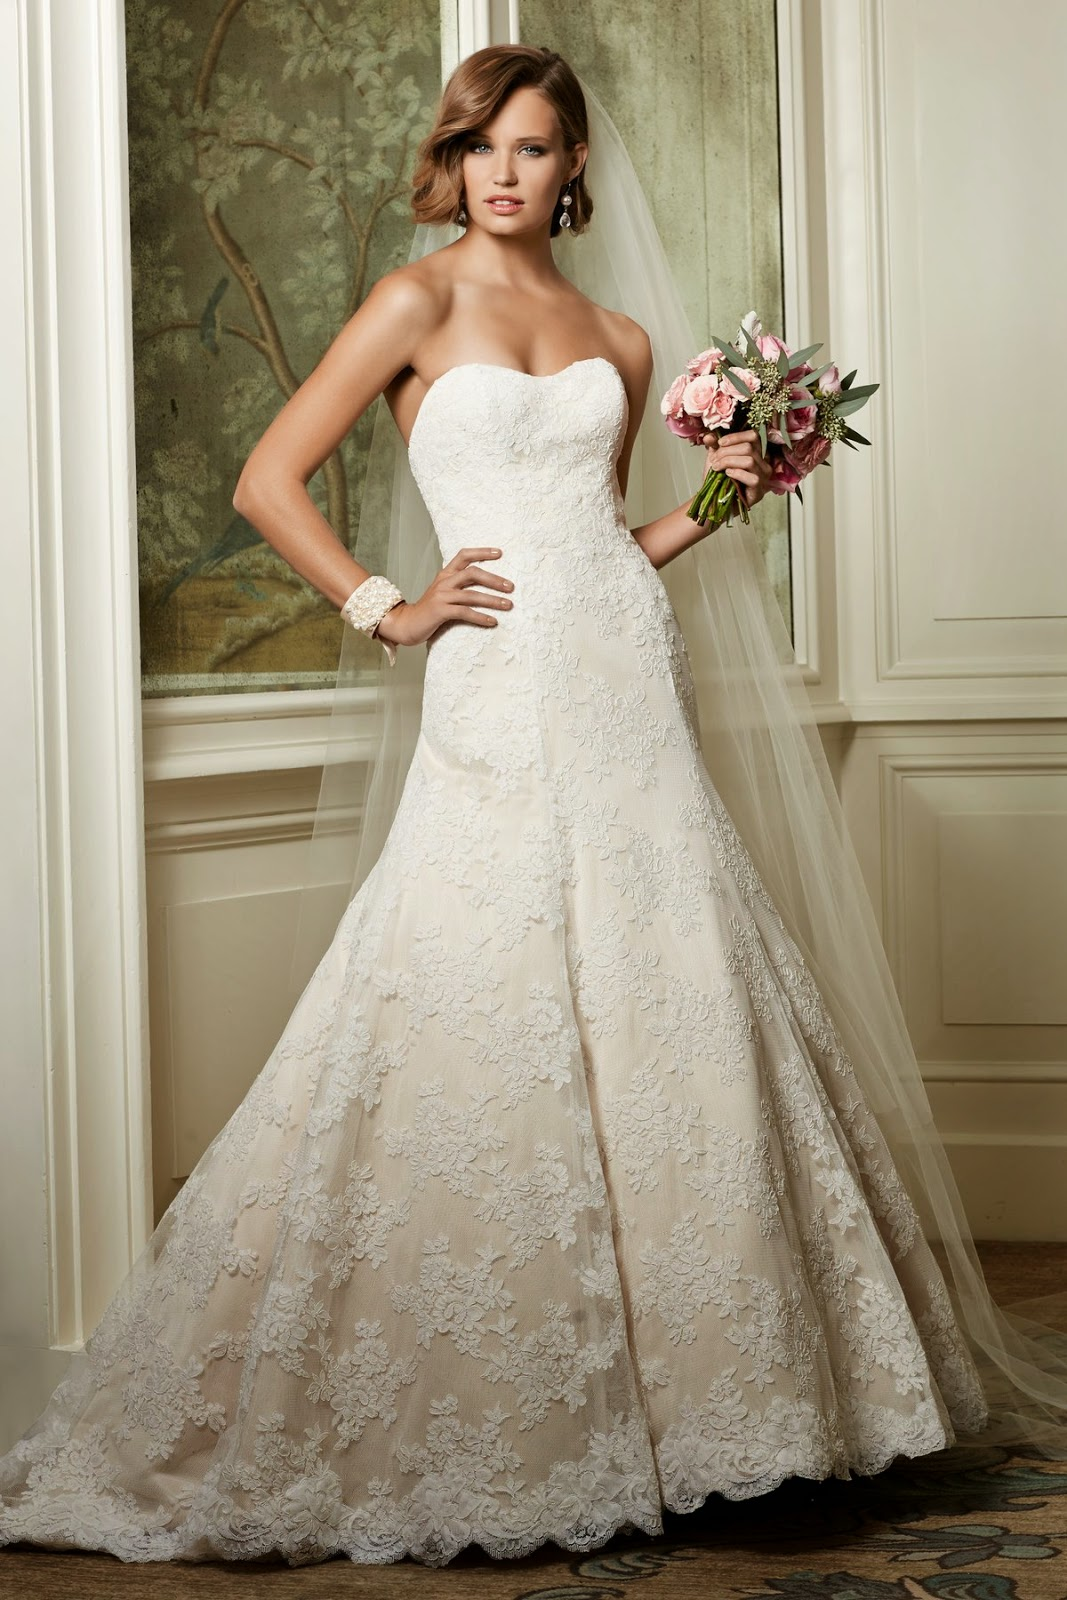 Vestidos de novia para senoras